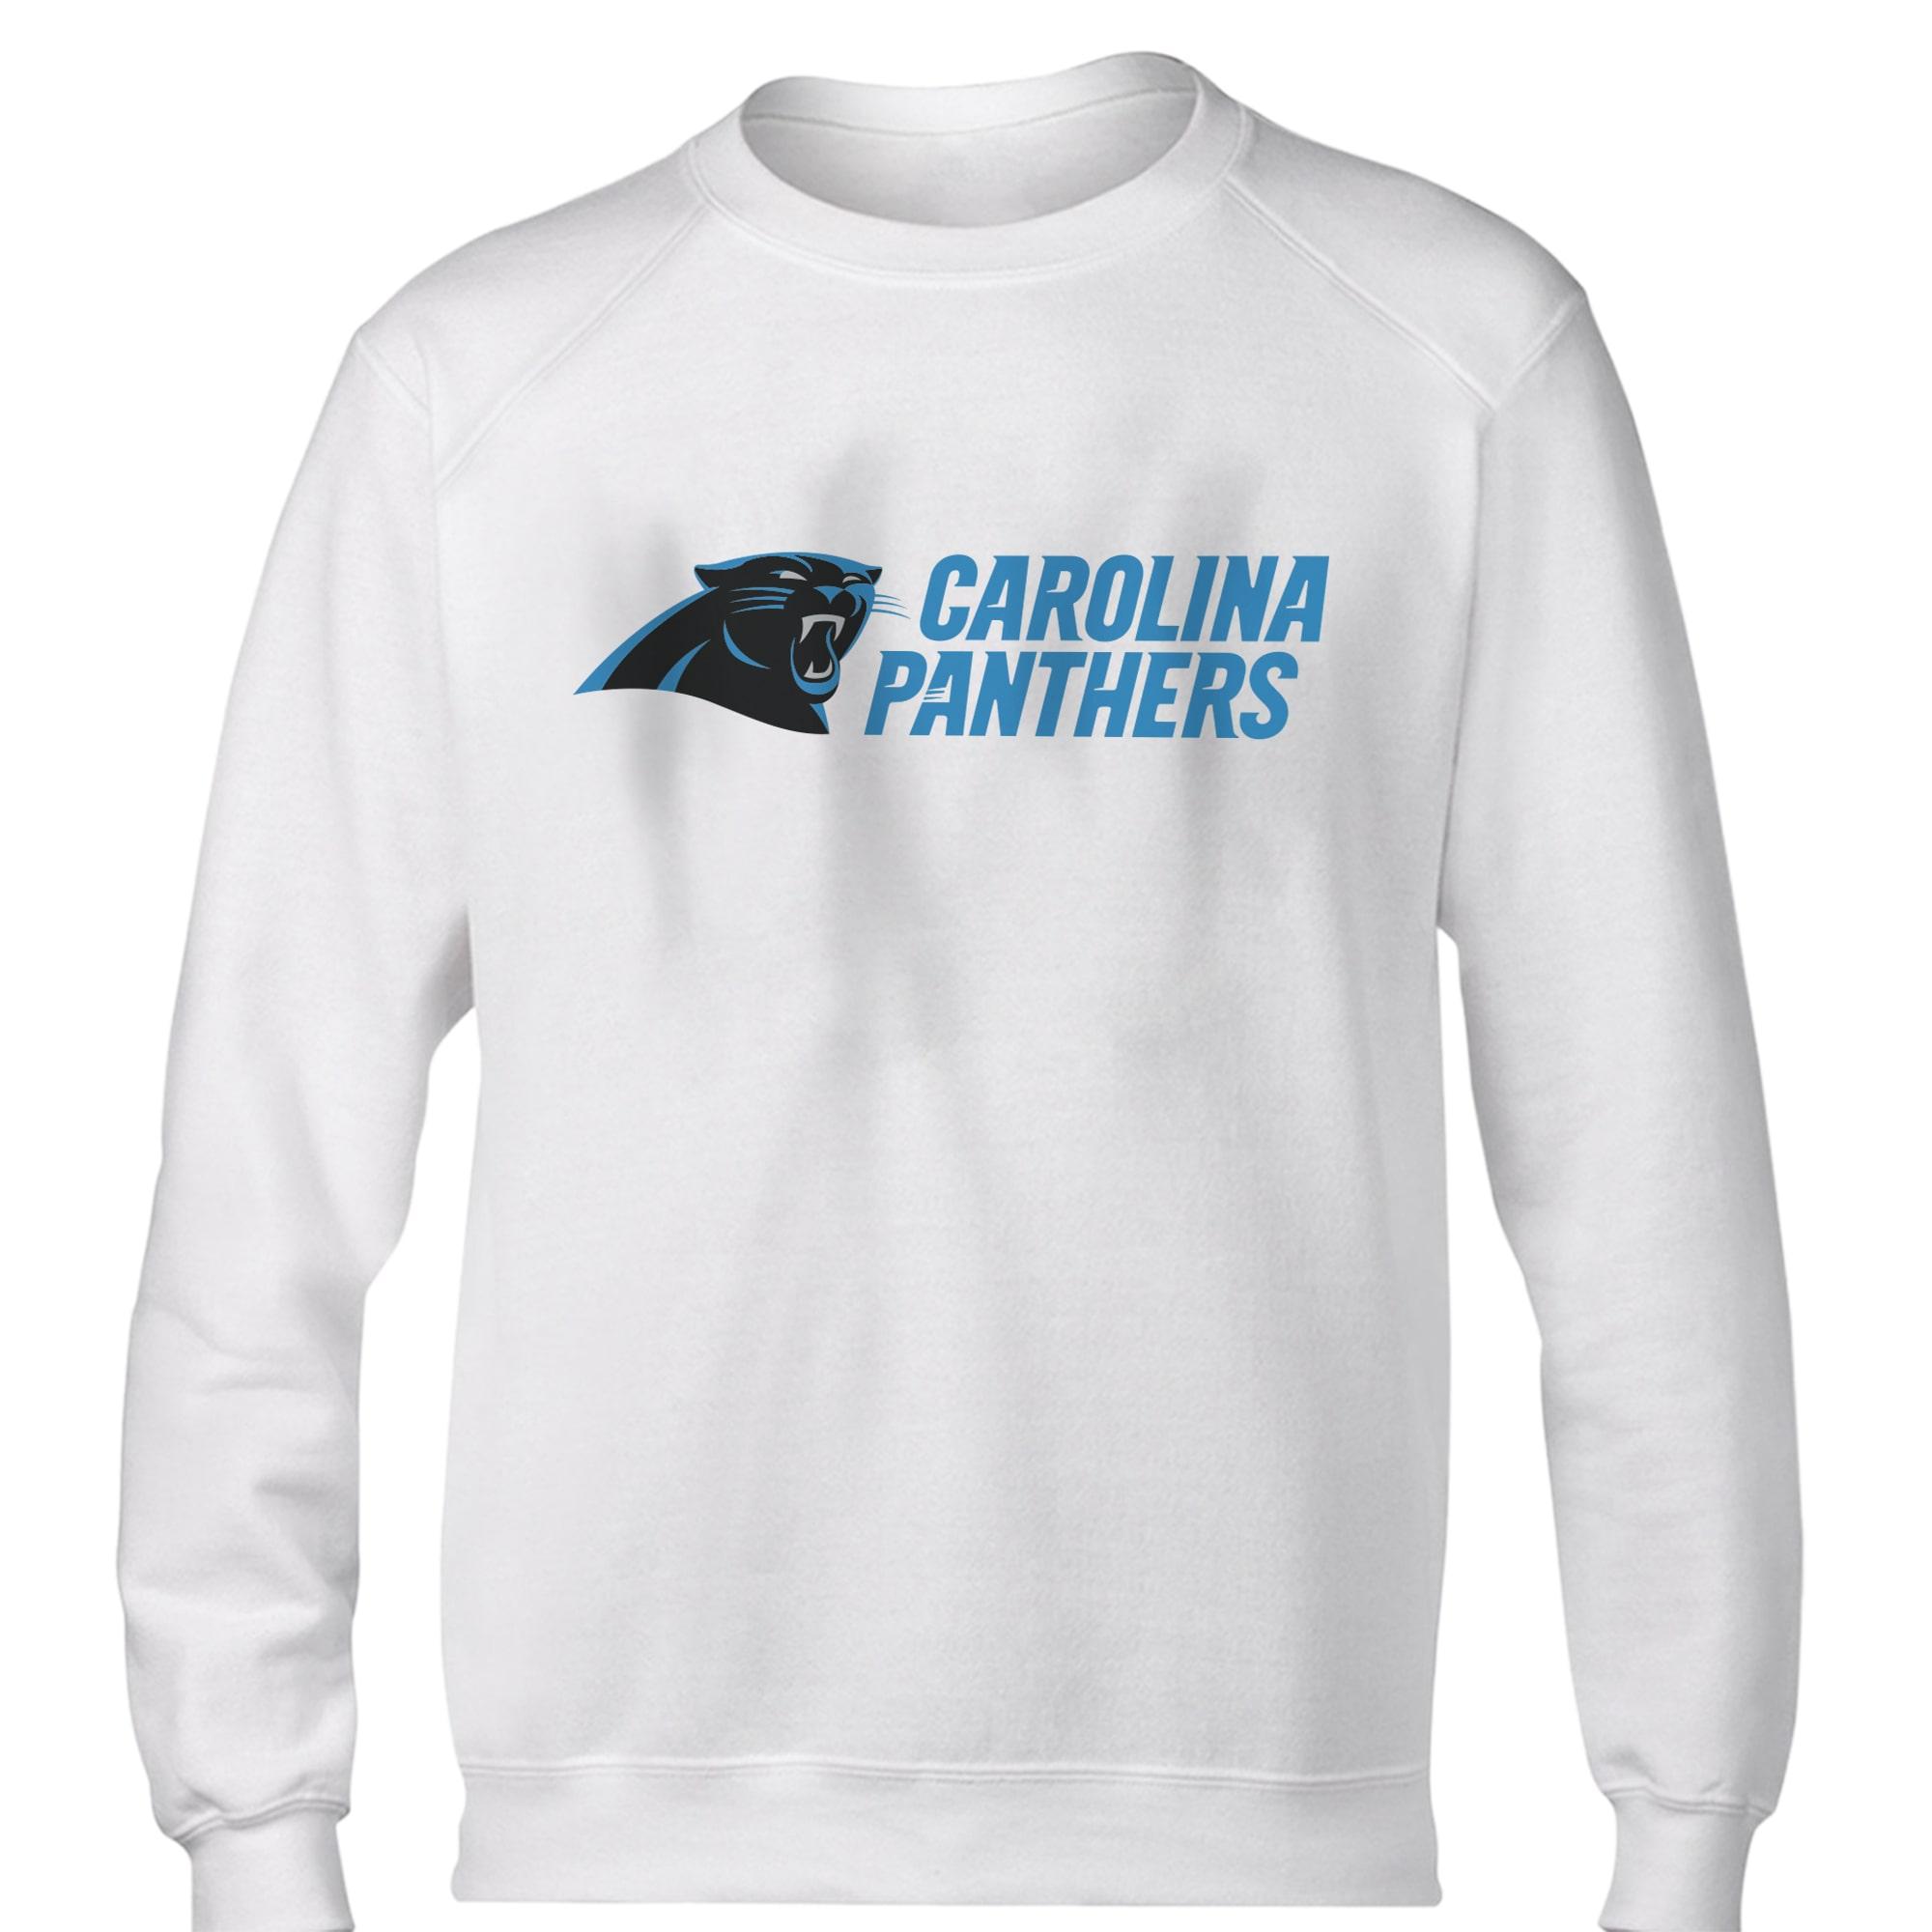 Carolina Panthers Basic (BSC-WHT-NP-C.PANTHERS-652)